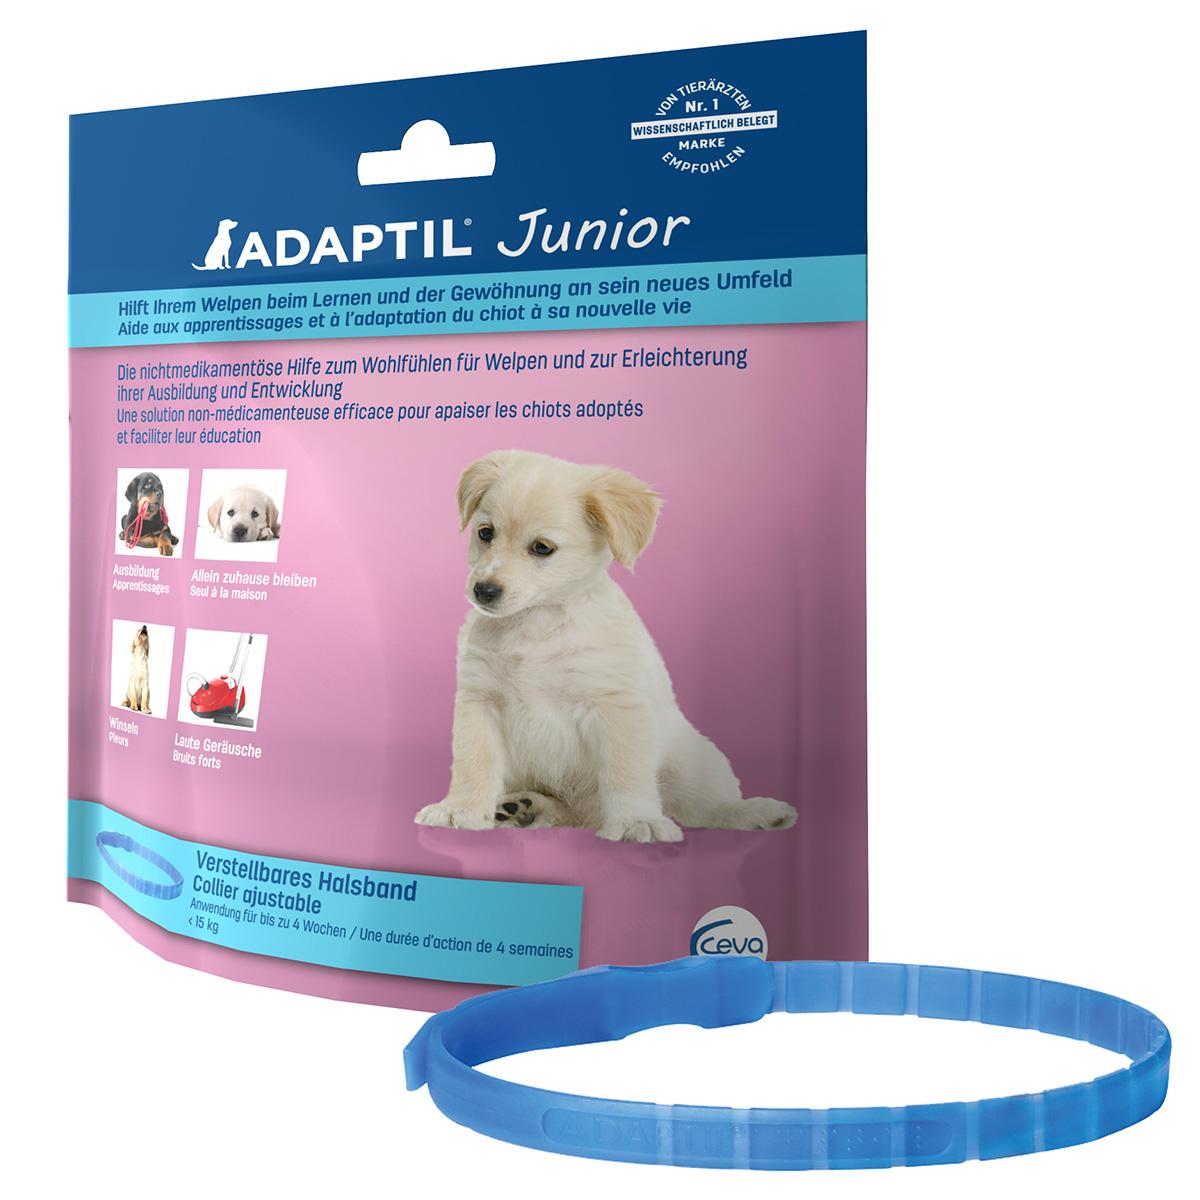 adaptil junior halsband g nstig kaufen bei zooroyal. Black Bedroom Furniture Sets. Home Design Ideas